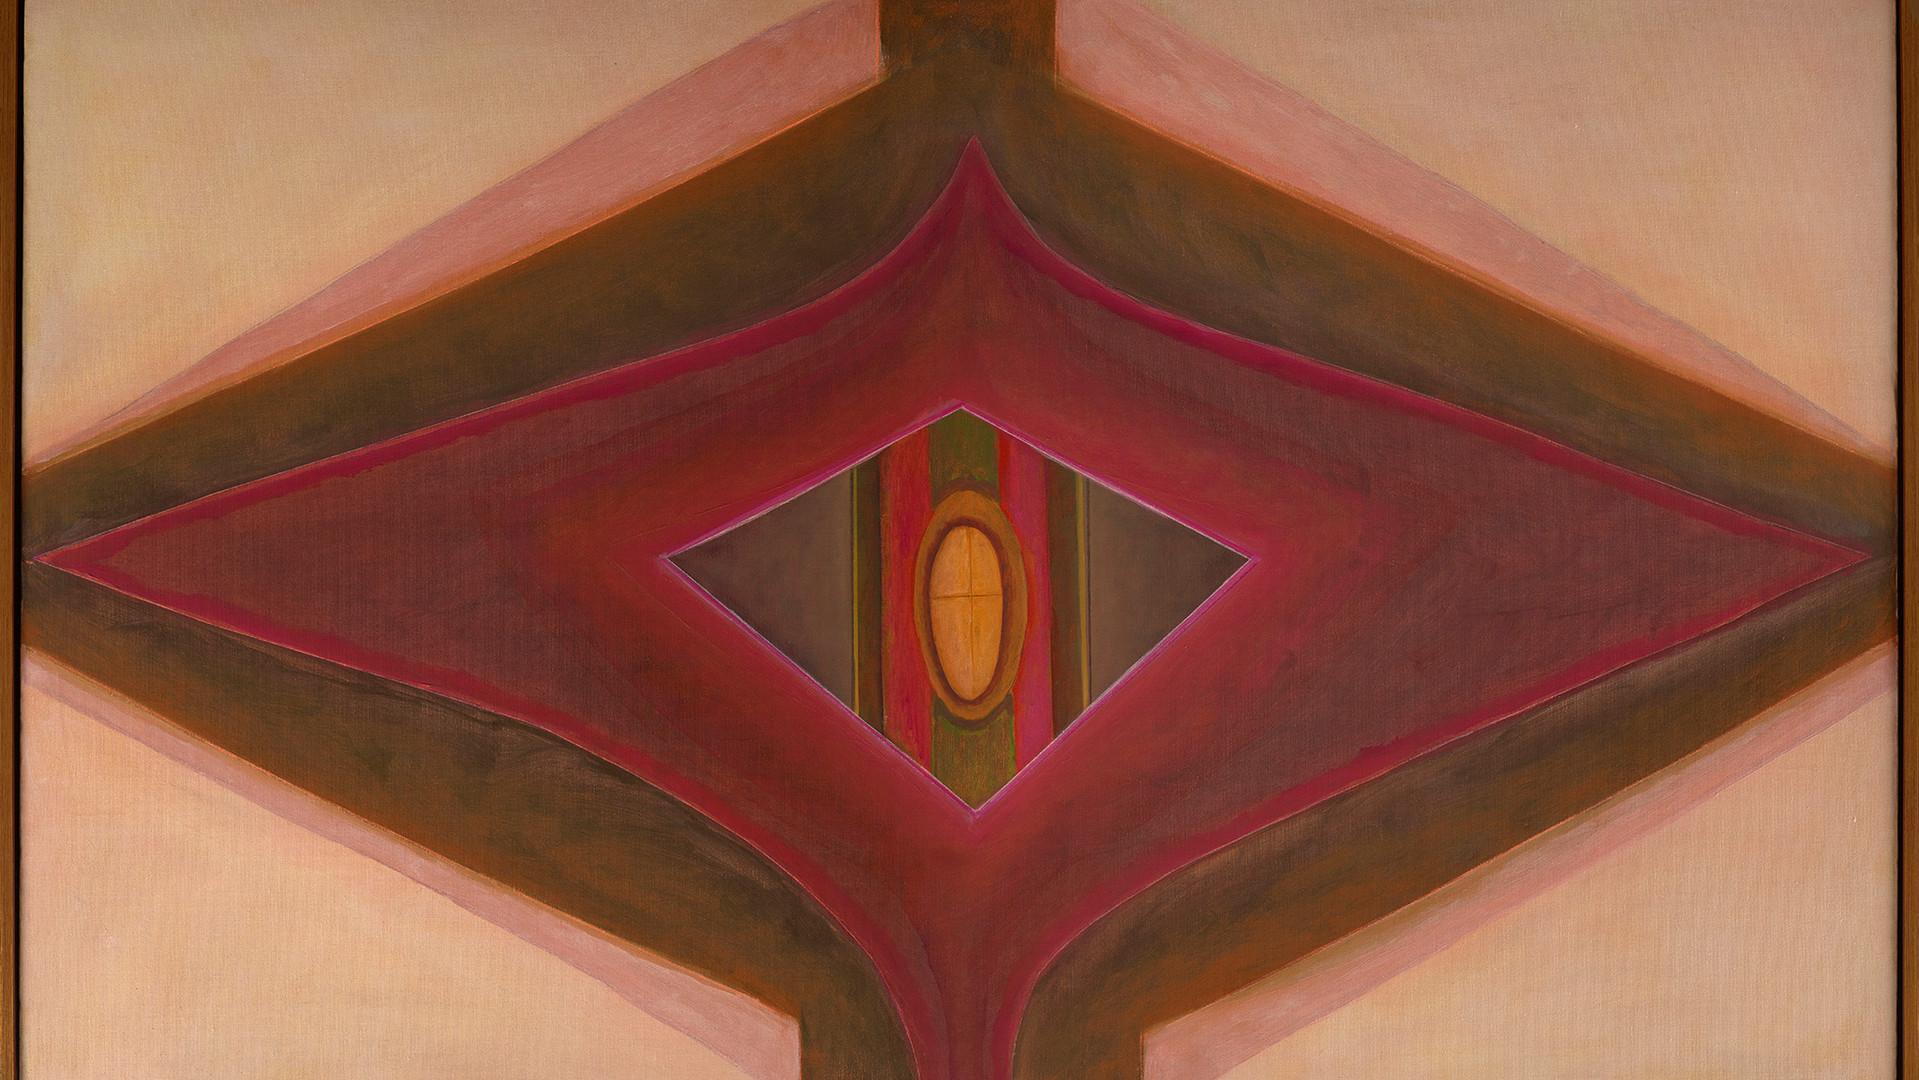 Ida Kohlmeyer (1912-1997) Cloistered, 1969  Oil on canvas 34 1/2 x 57 in. (87.6 x 144.8 cm) copyright Estate of Ida Kohlmeyer. Courtesy Berry Campbell, New York.